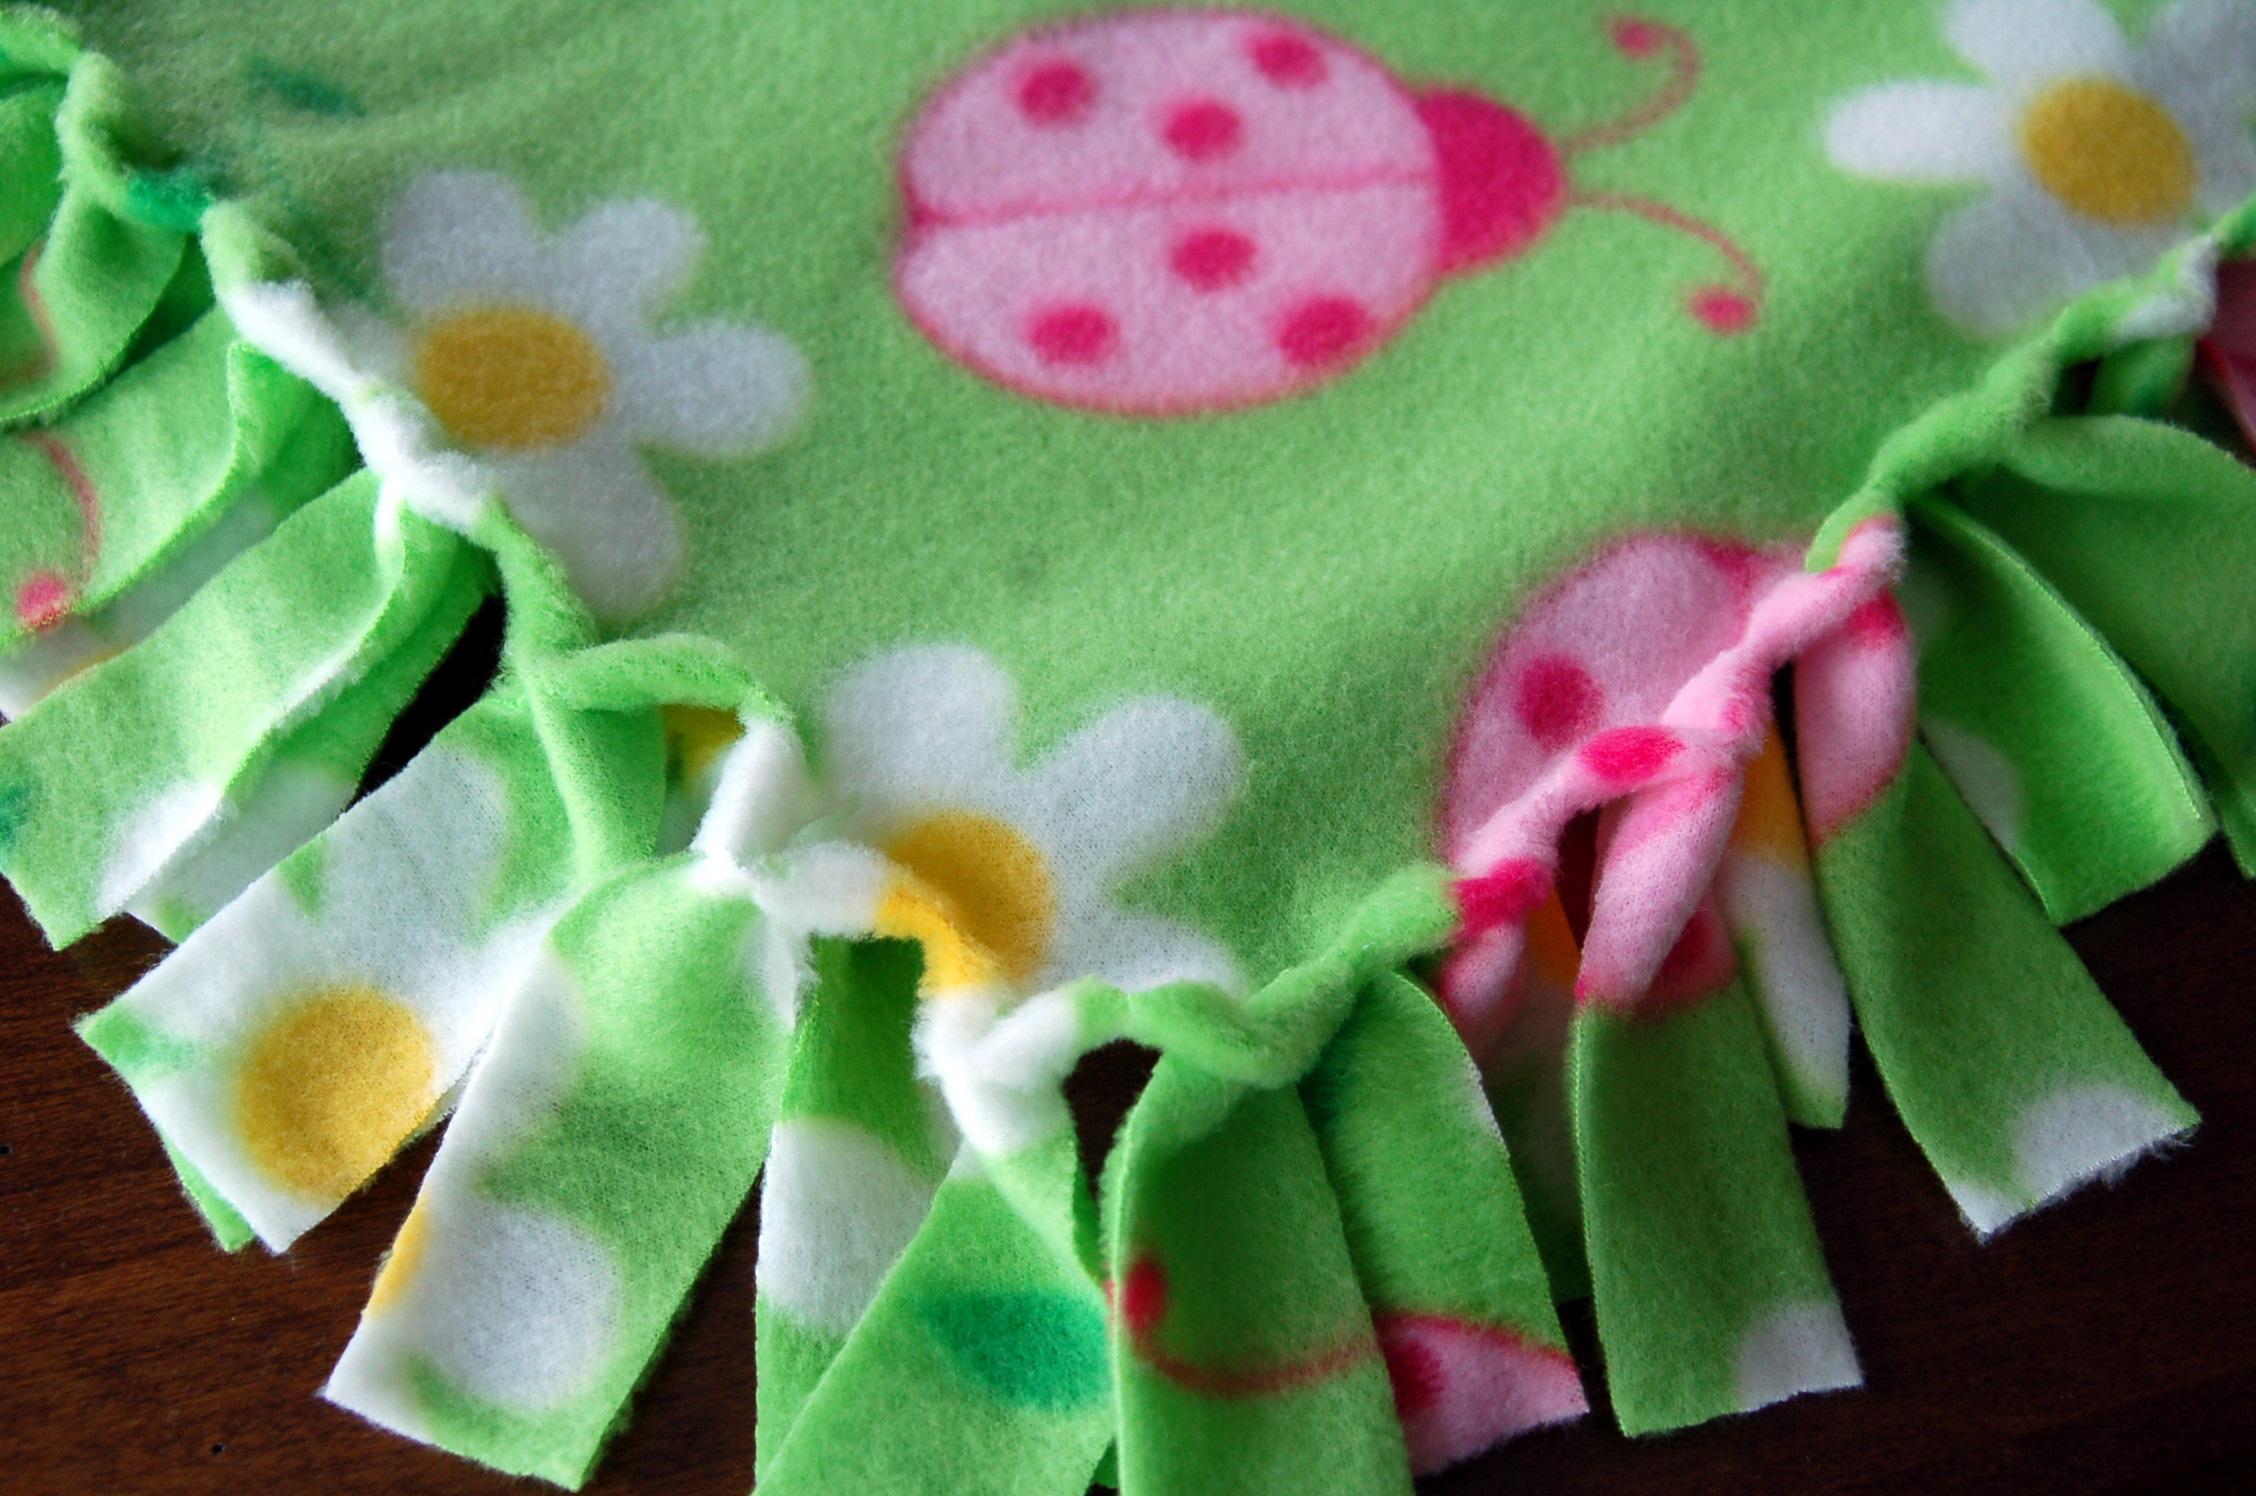 Blanket clipart fleece Fringed Creations And Dot Fleece